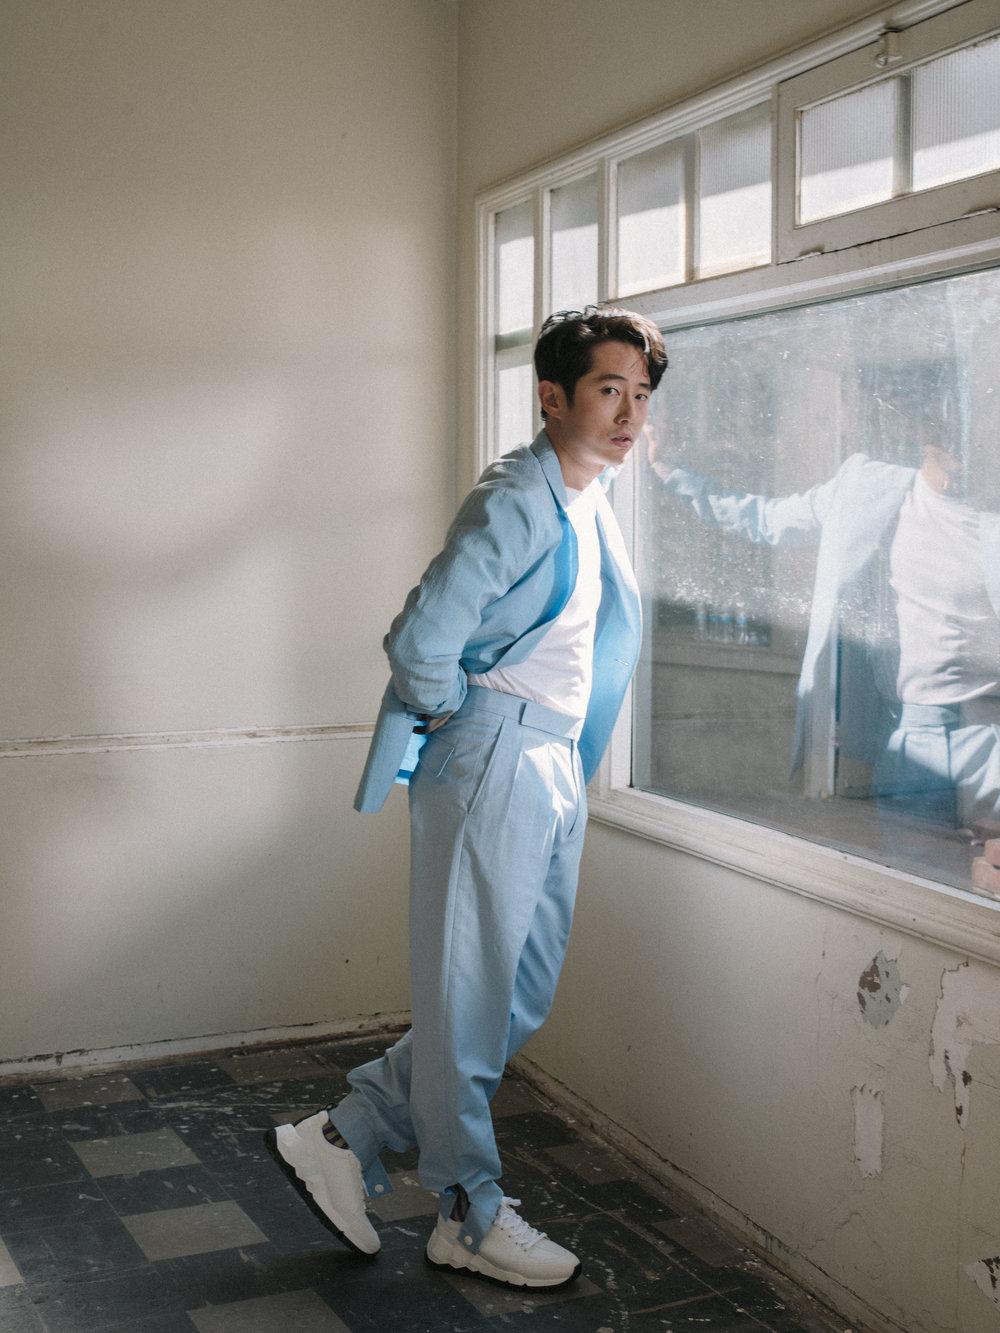 ERMENEGILDO ZEGNA COUTURE   suit,   BASSIKE     shirt,   PIERRE HARDY     shoes, and   LU CHUNG     socks.